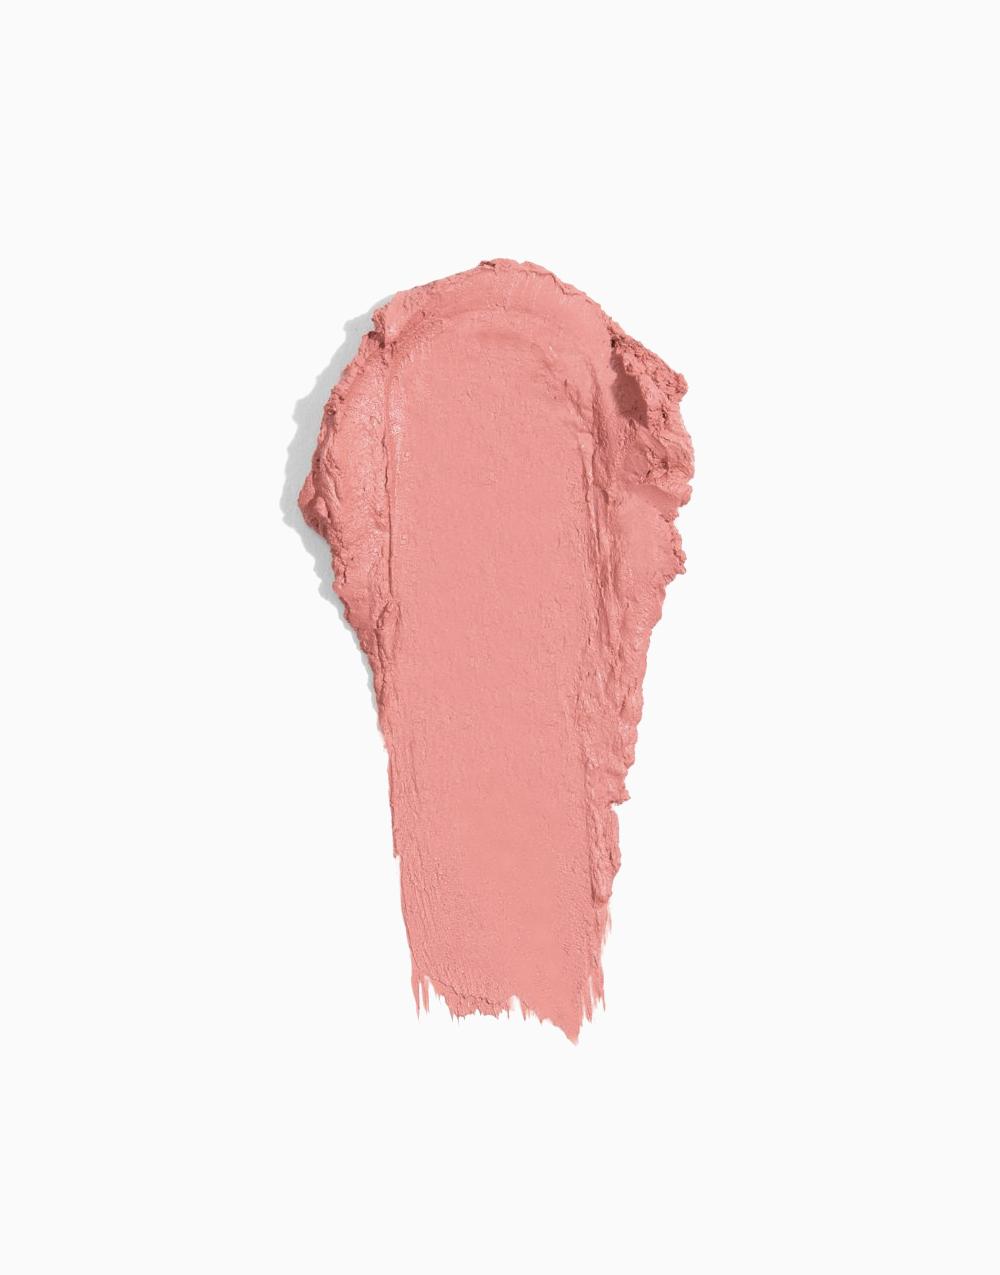 Lux Lipstick by ColourPop | Name Drop